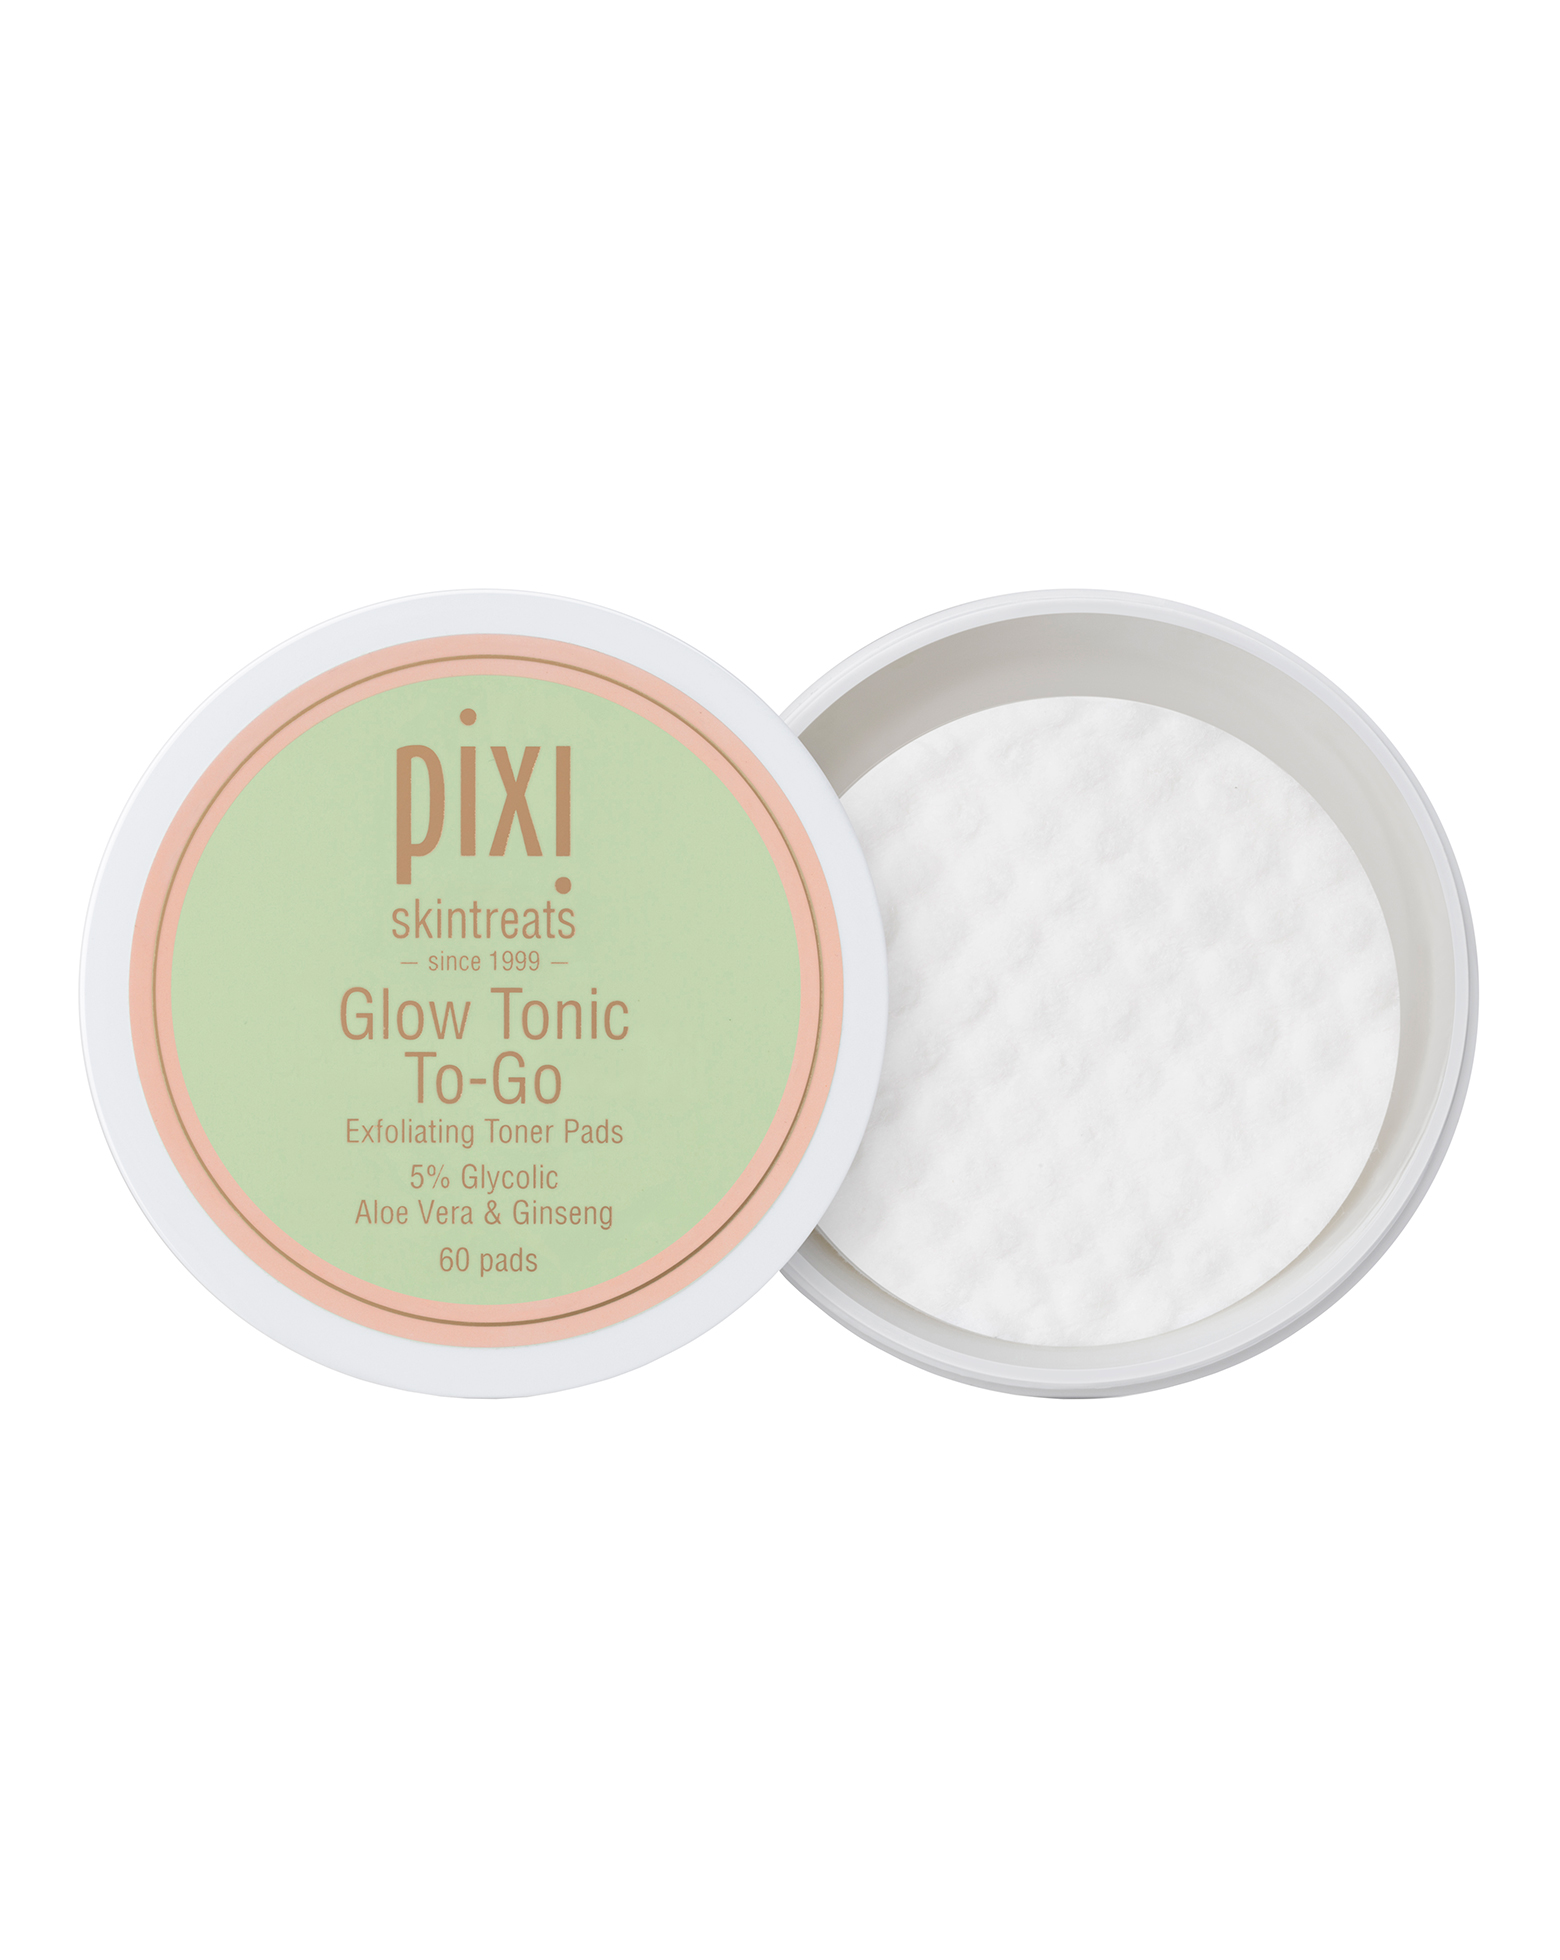 Pixi Glow Tonic To-Go - Amanda: